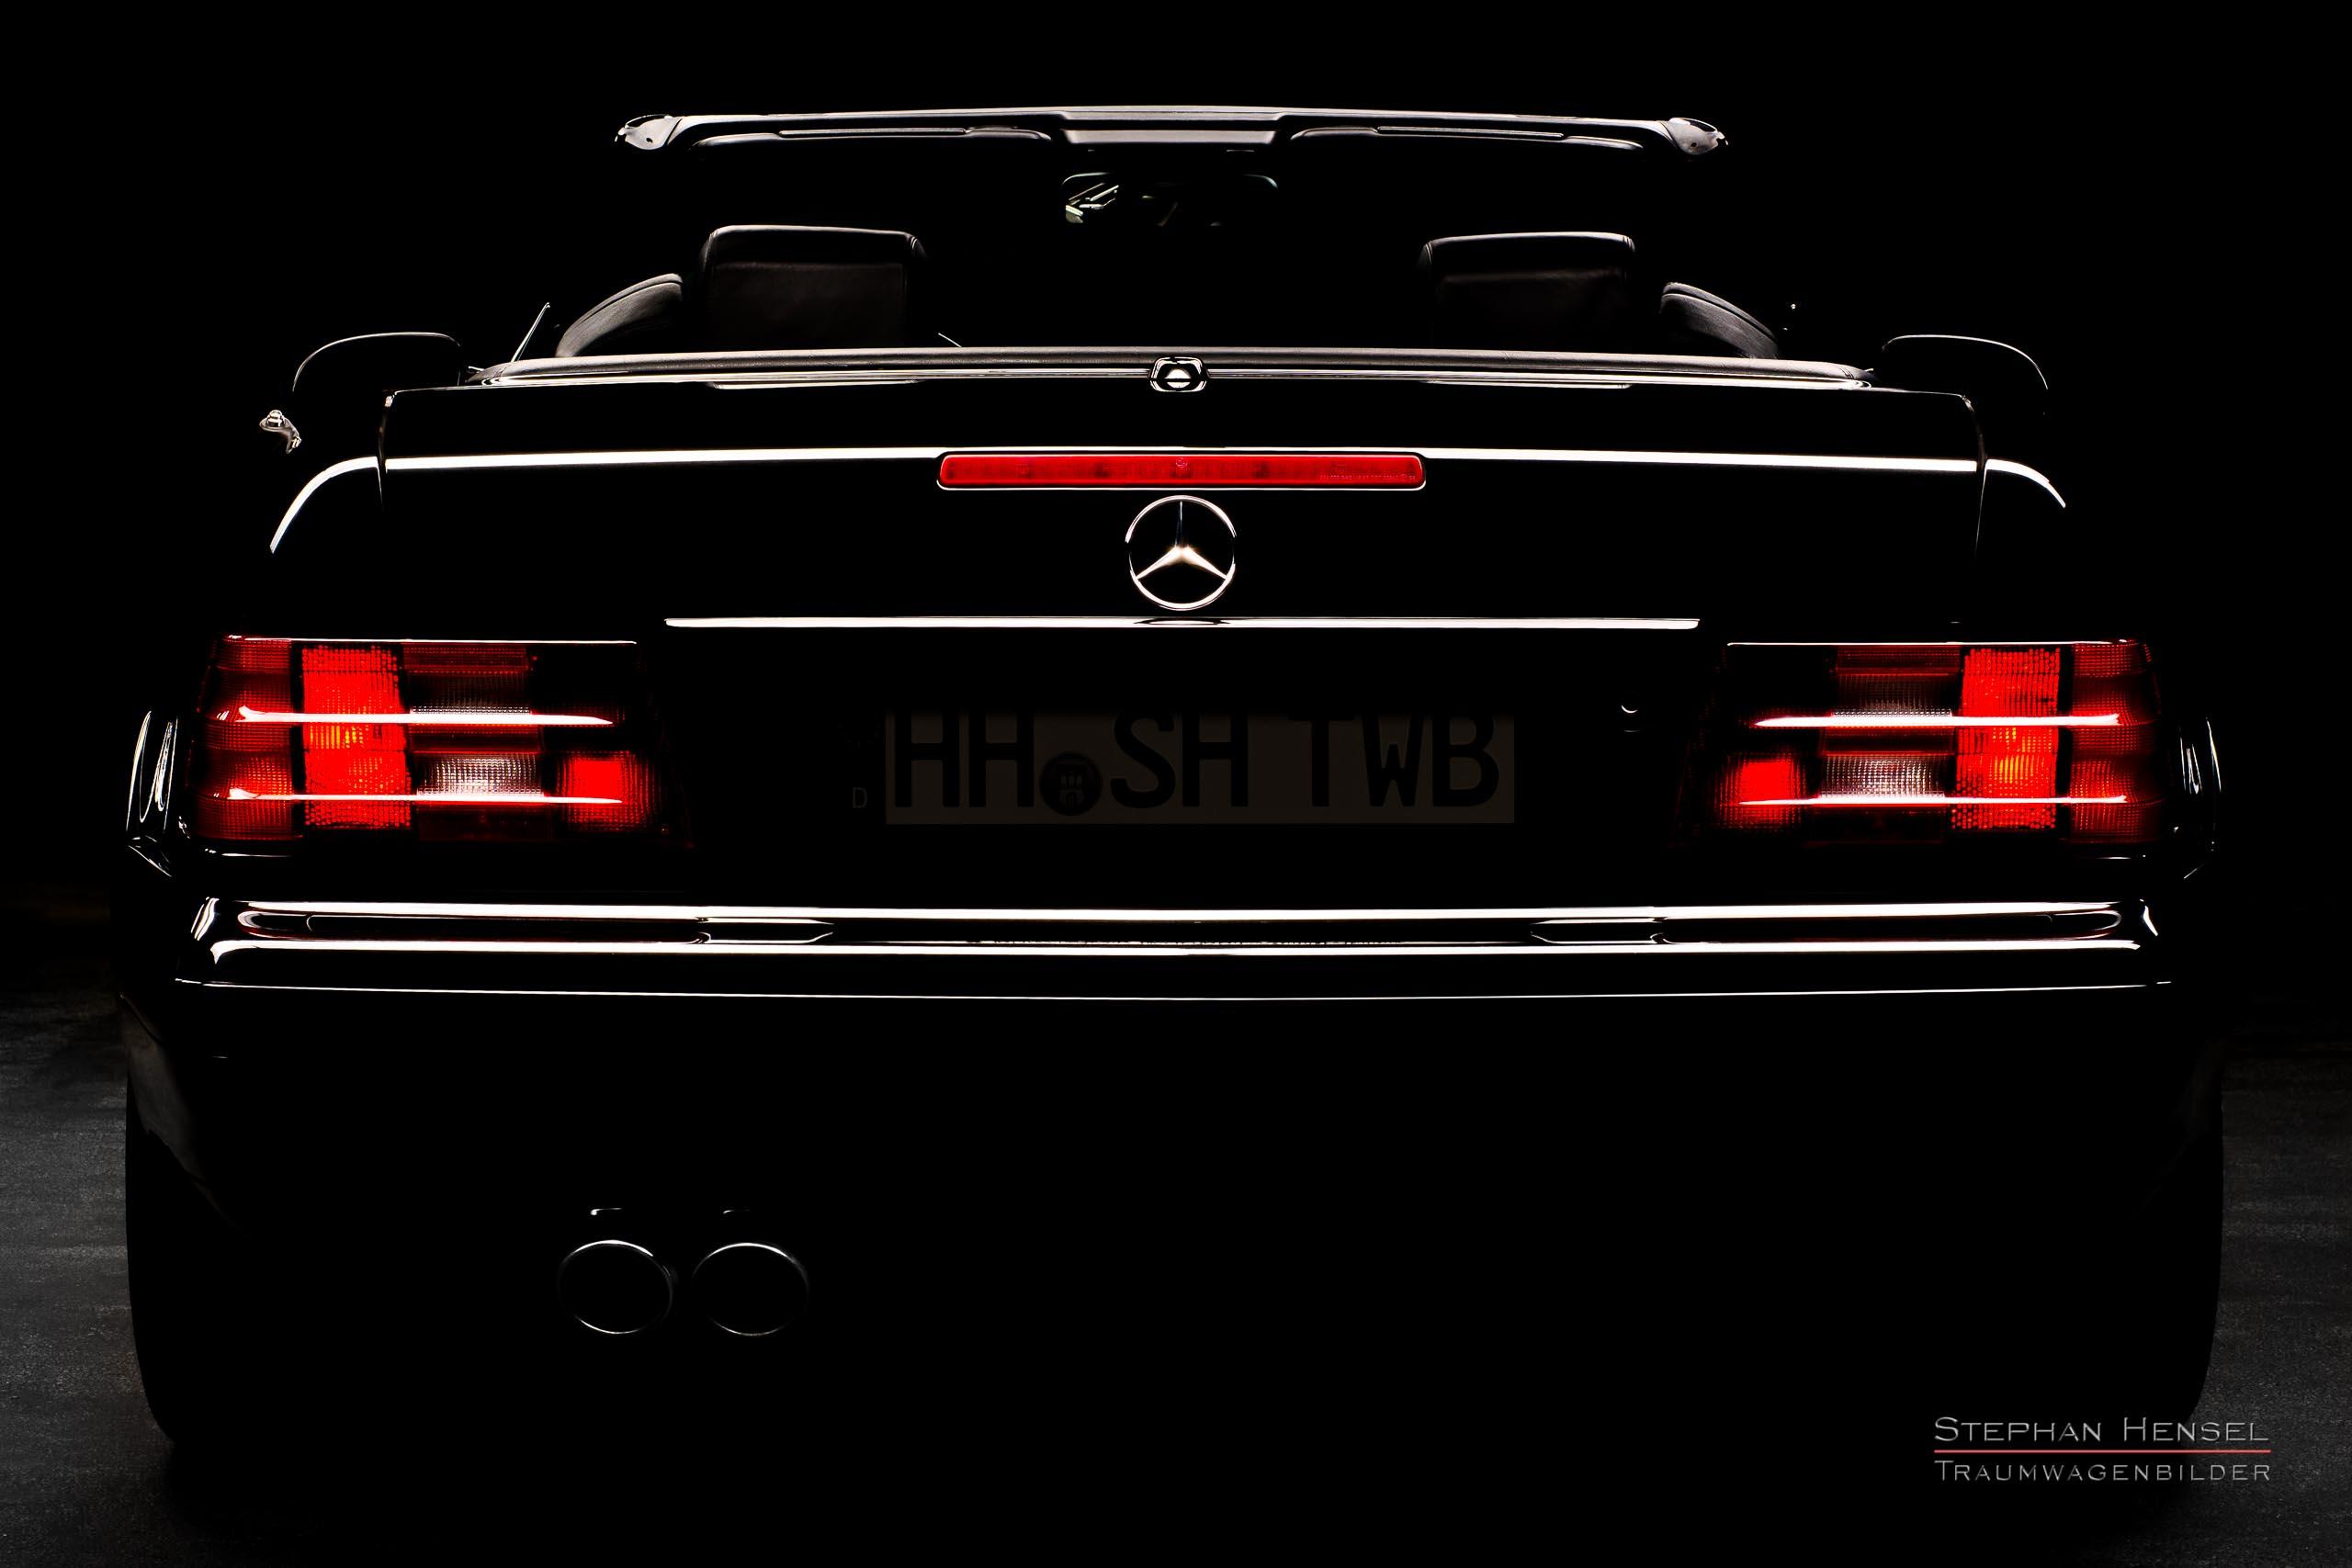 Mercedes-Benz SL 320, Heckansicht, Autofotograf: Stephan Hensel, Oldtimerfotograf, Hamburg